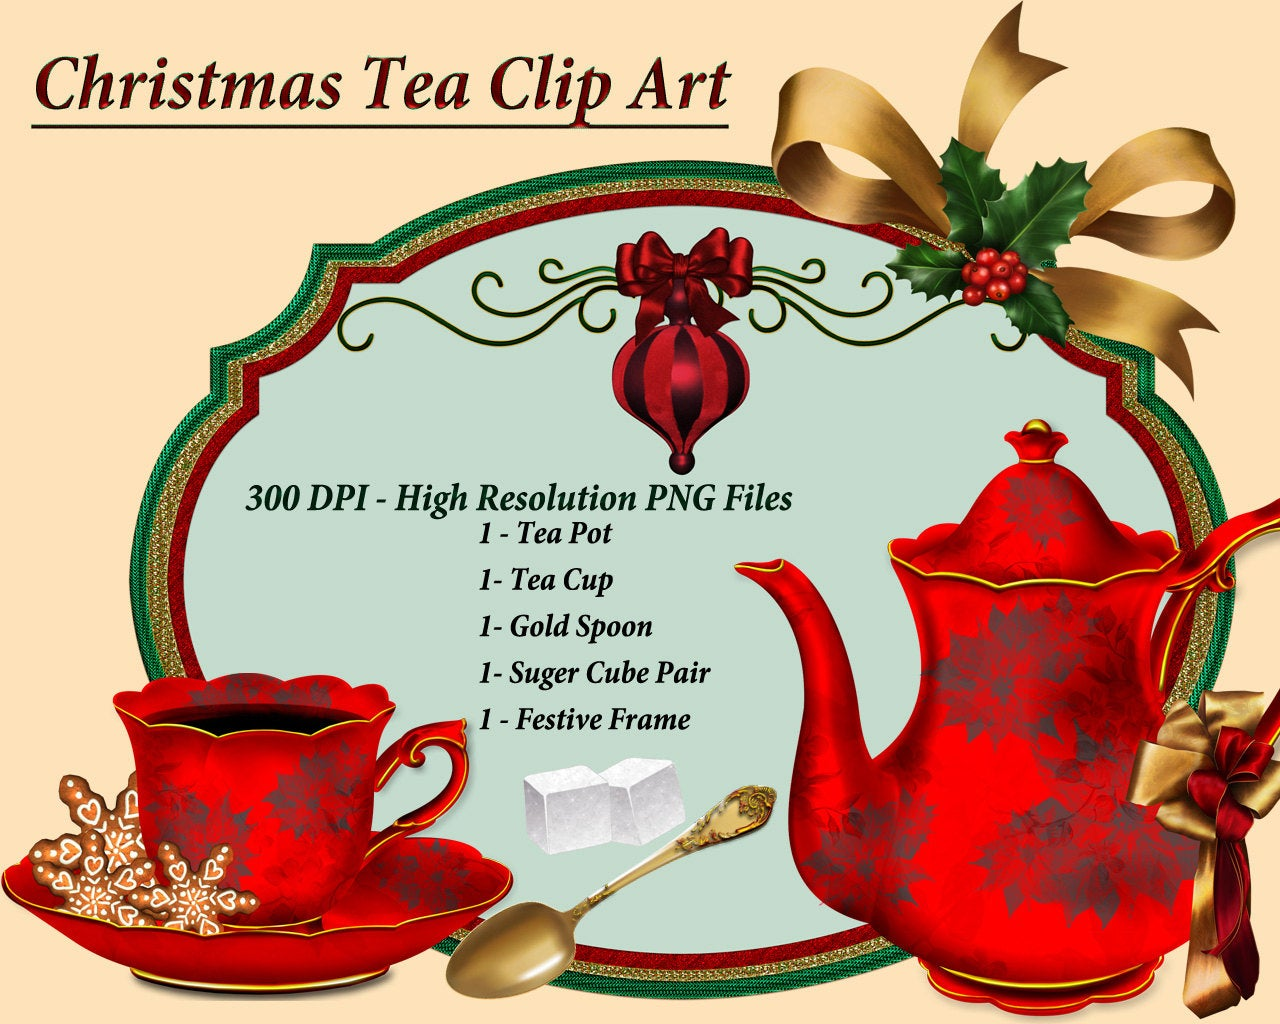 Christmas Tea Clip Art, Tea Cup Clipart, Tea Clipart.